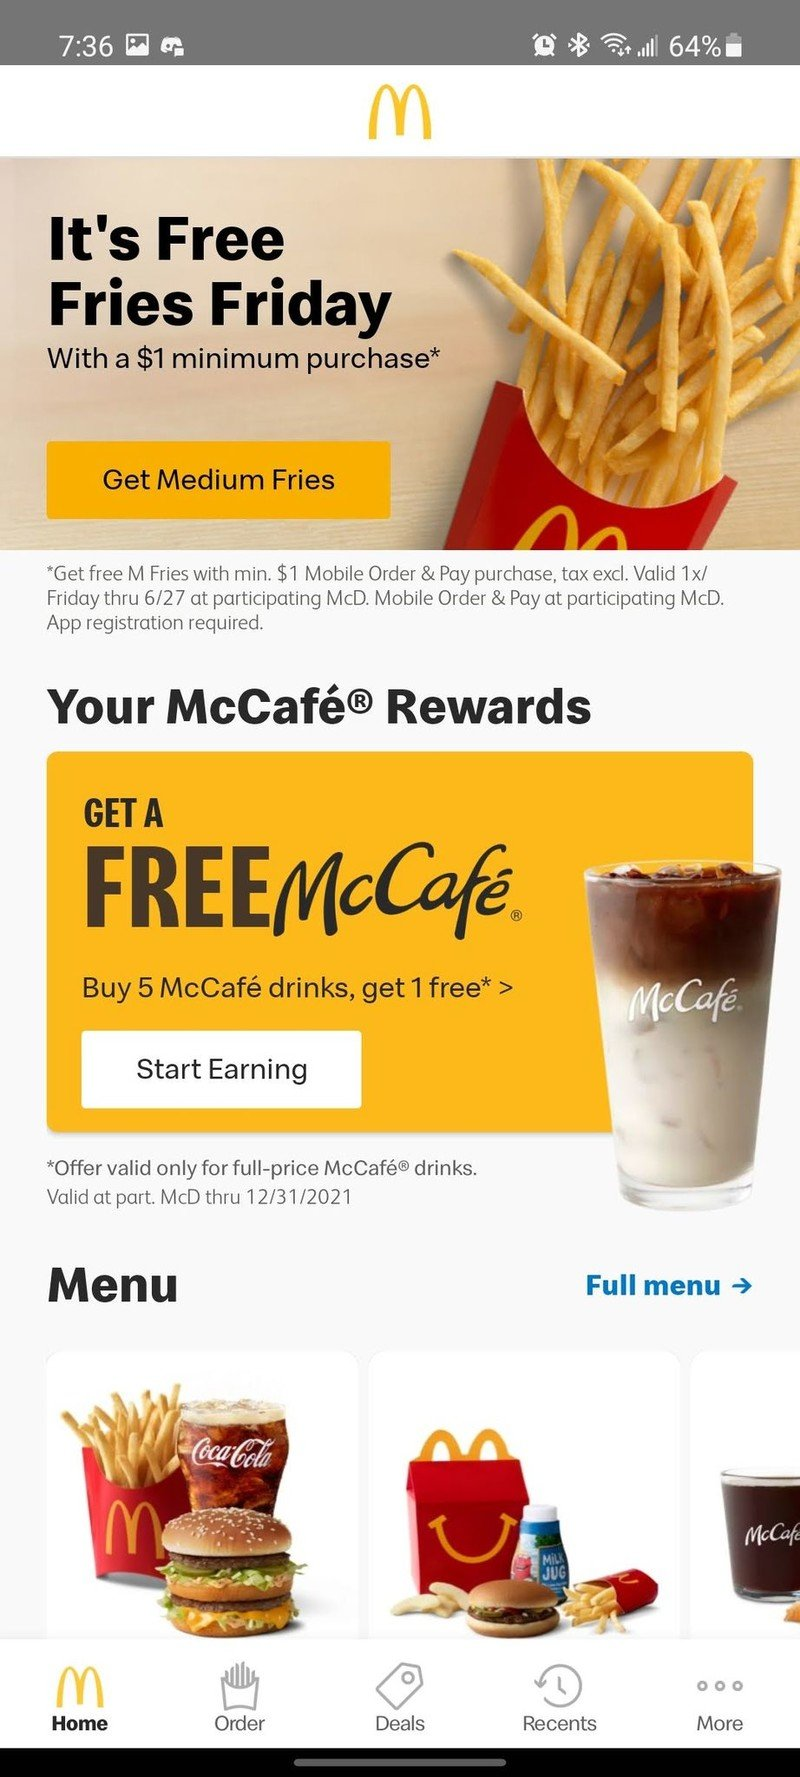 mcdonalds-free-stuff-gamification.jpg